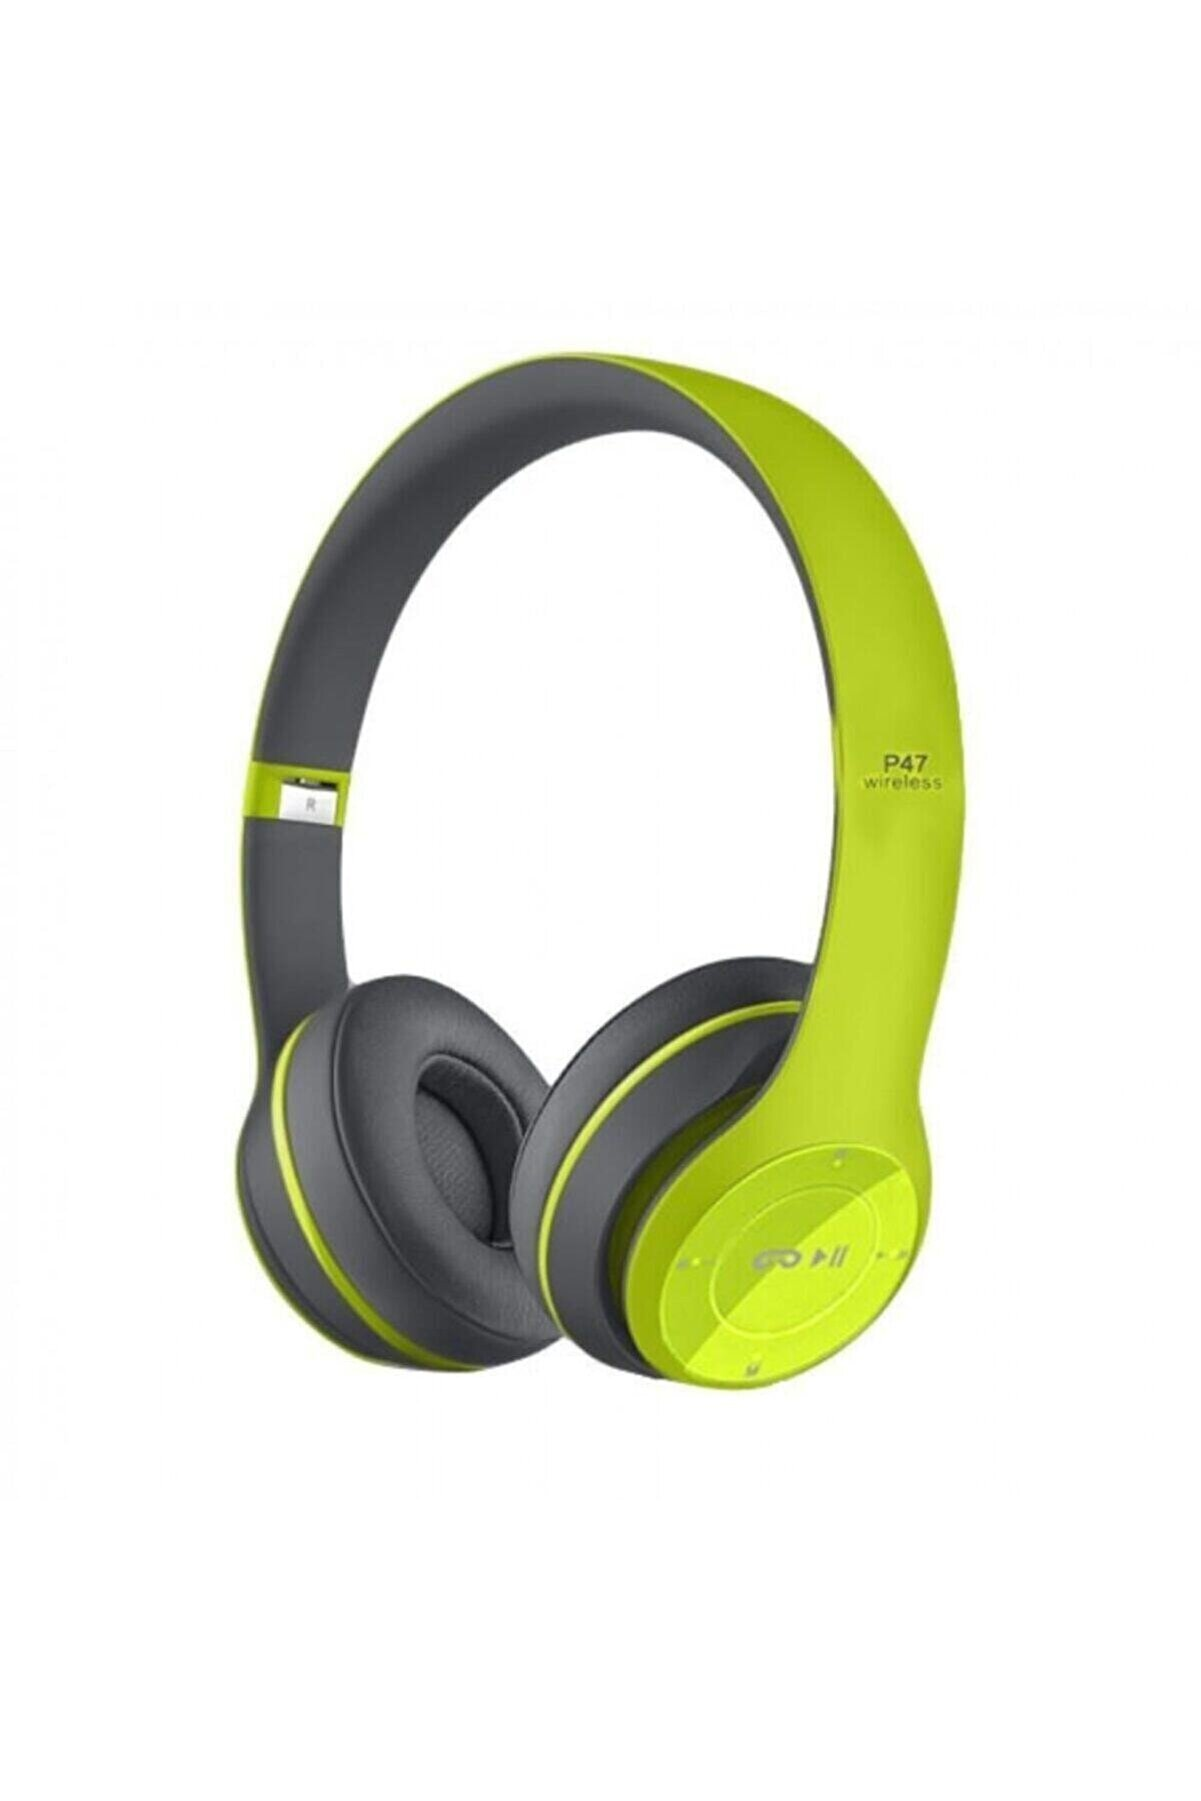 Platoon Yeşil P47 Bluetooth Kablosuz Kulak Üstü Kulaklık